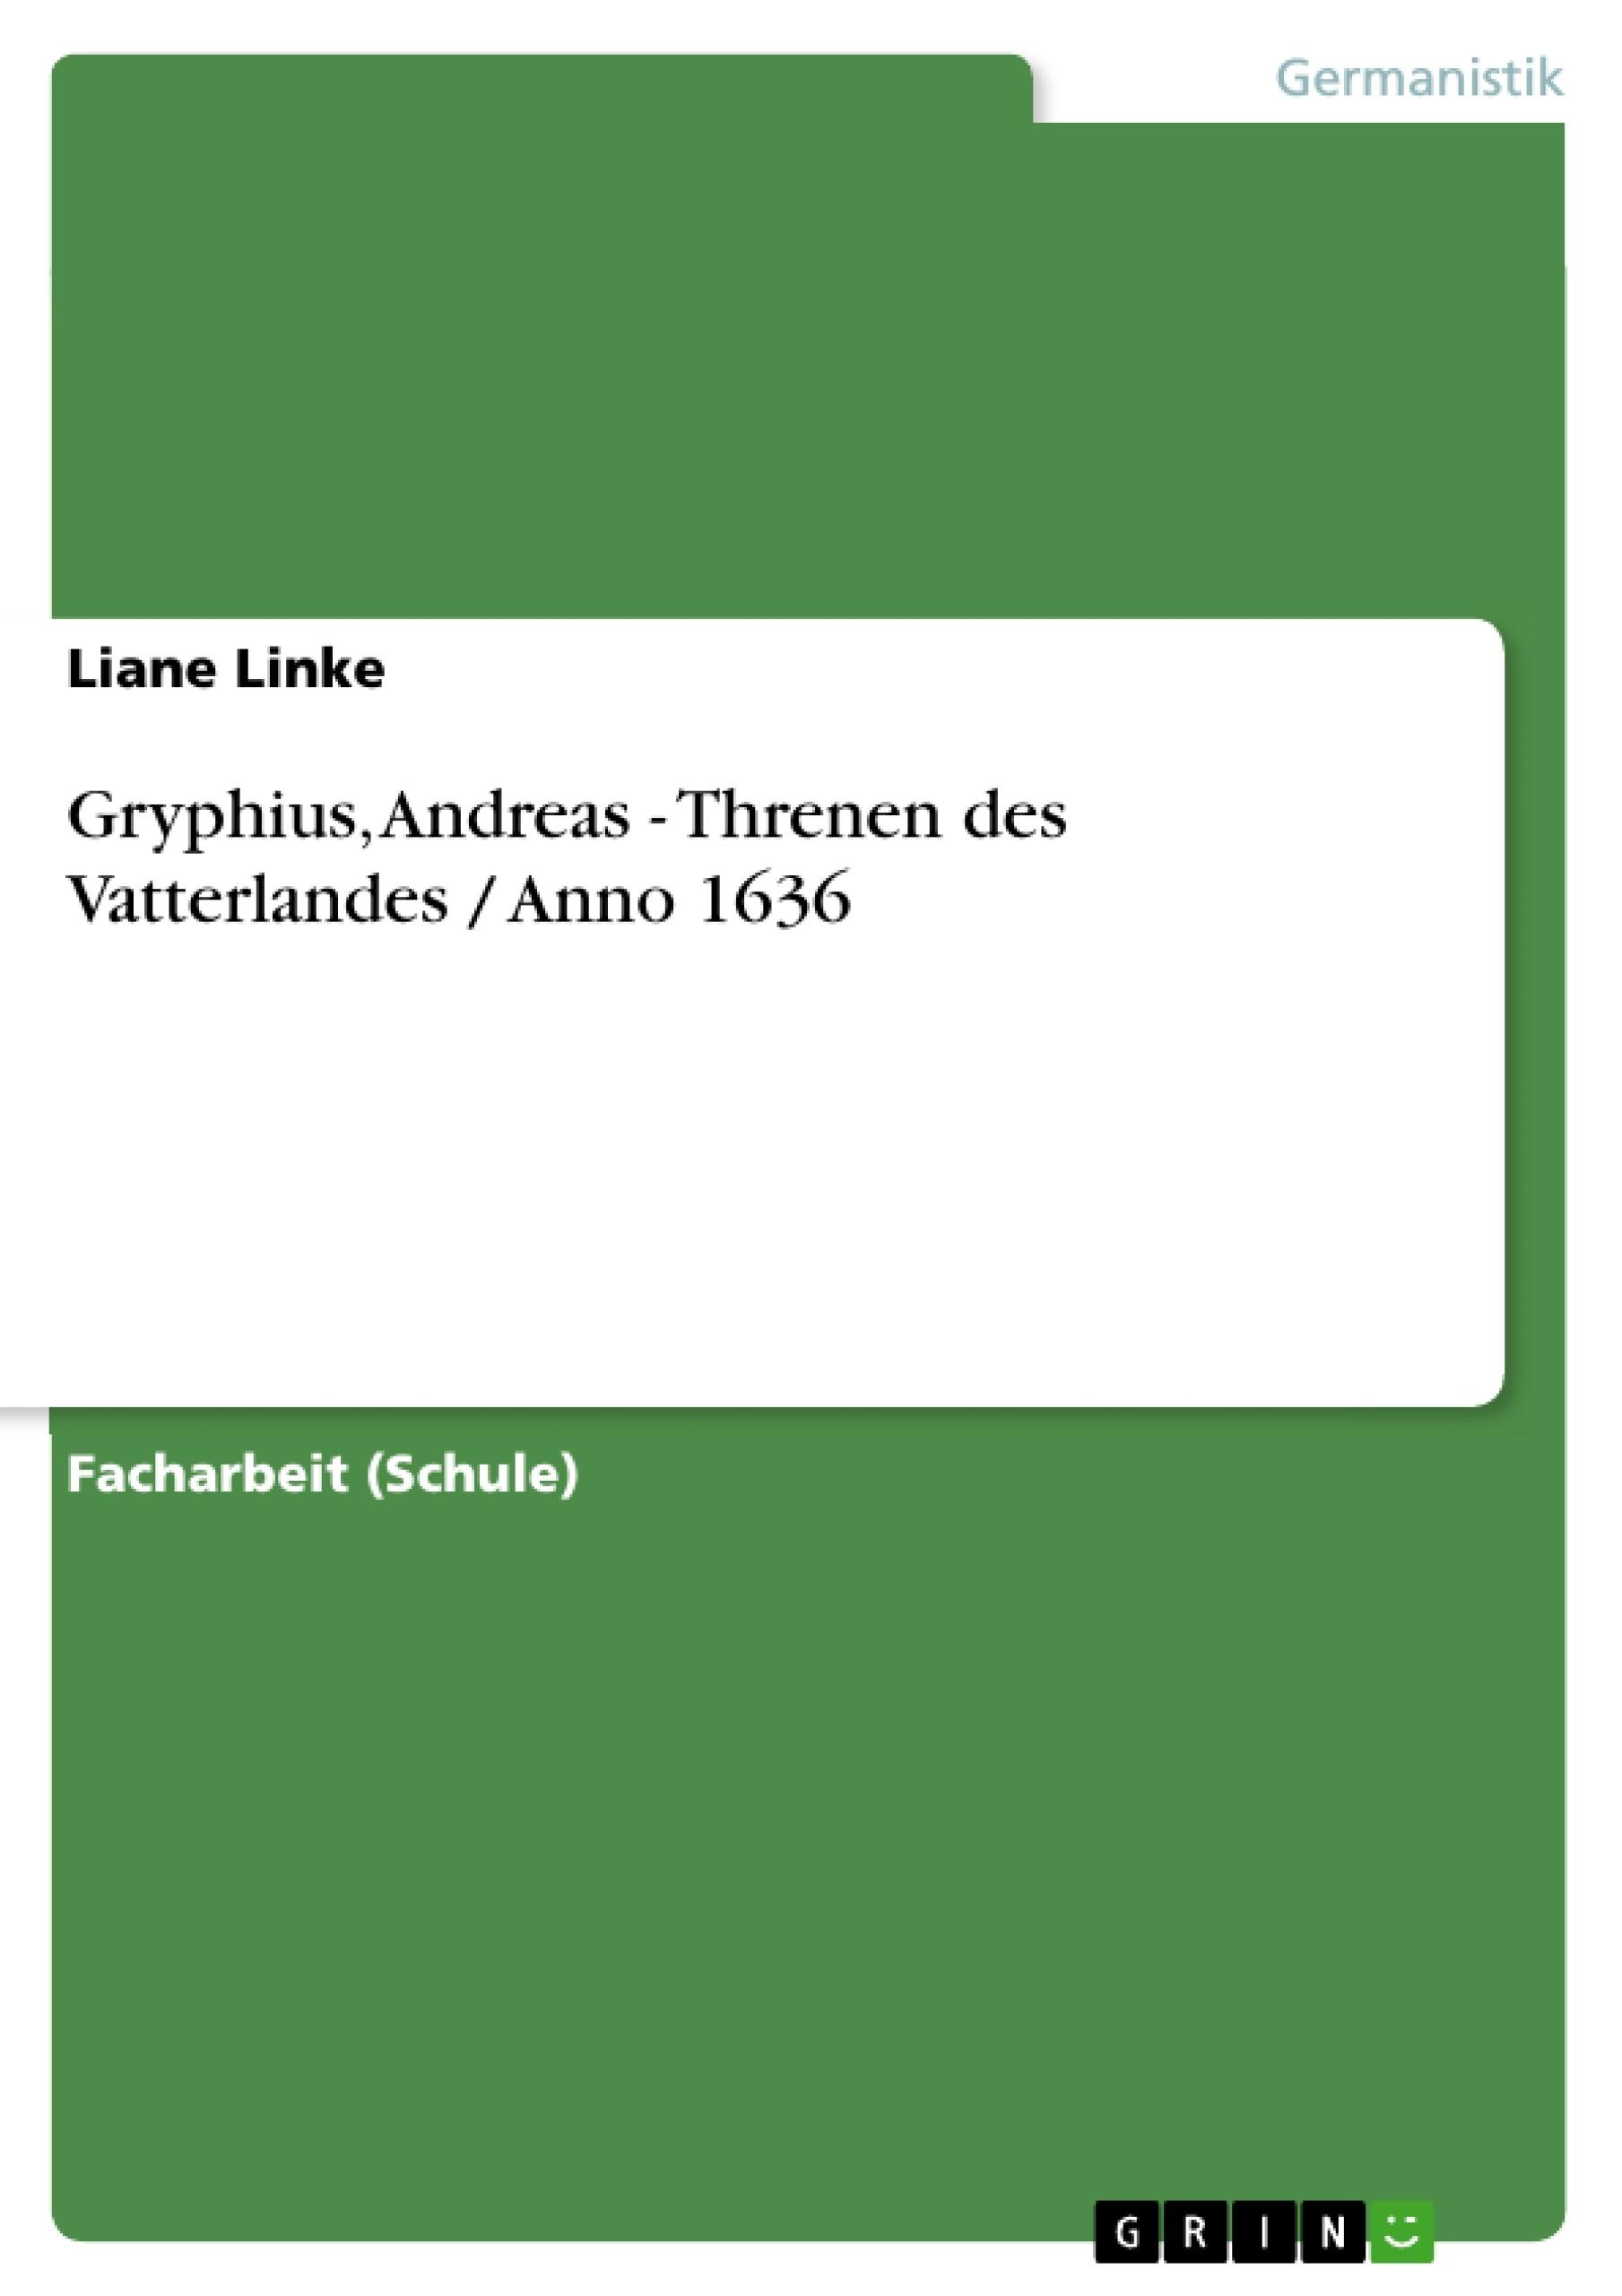 Titel: Gryphius, Andreas - Threnen des Vatterlandes / Anno 1636